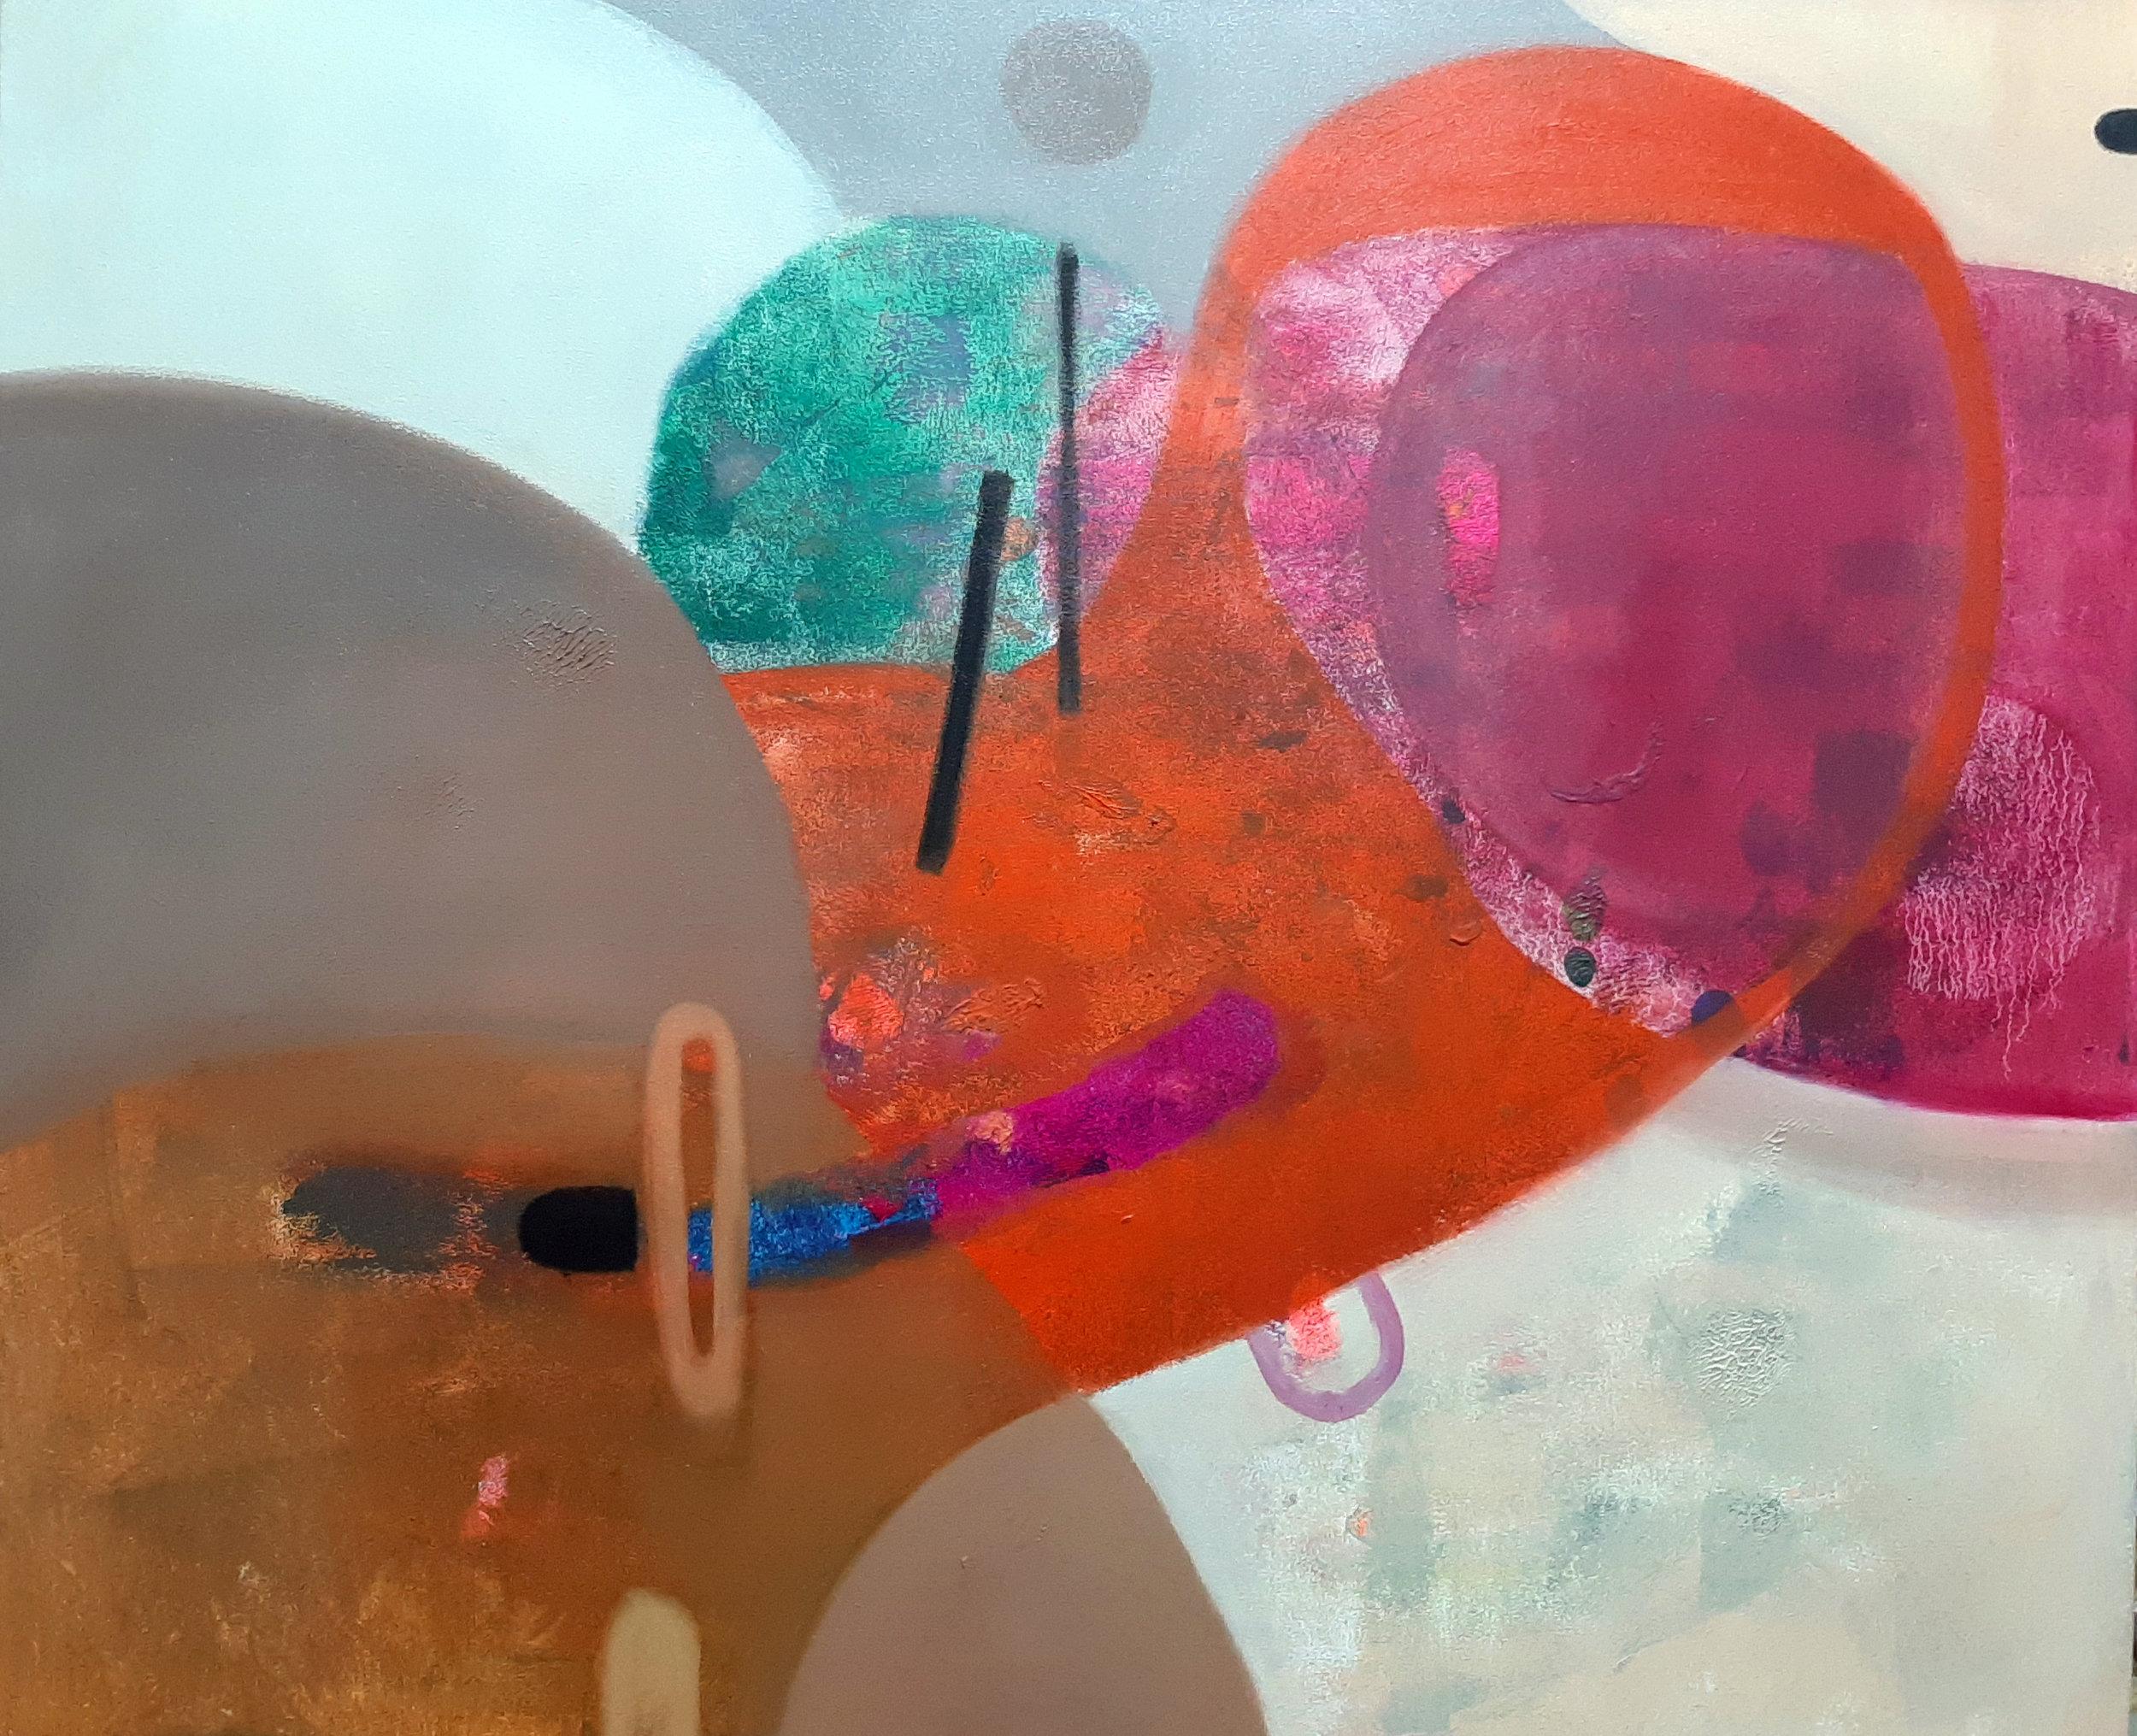 Tangerine - Oil and Oil Pastel on Canvas1000 x 1200 mmUnframed22 500 ZAR